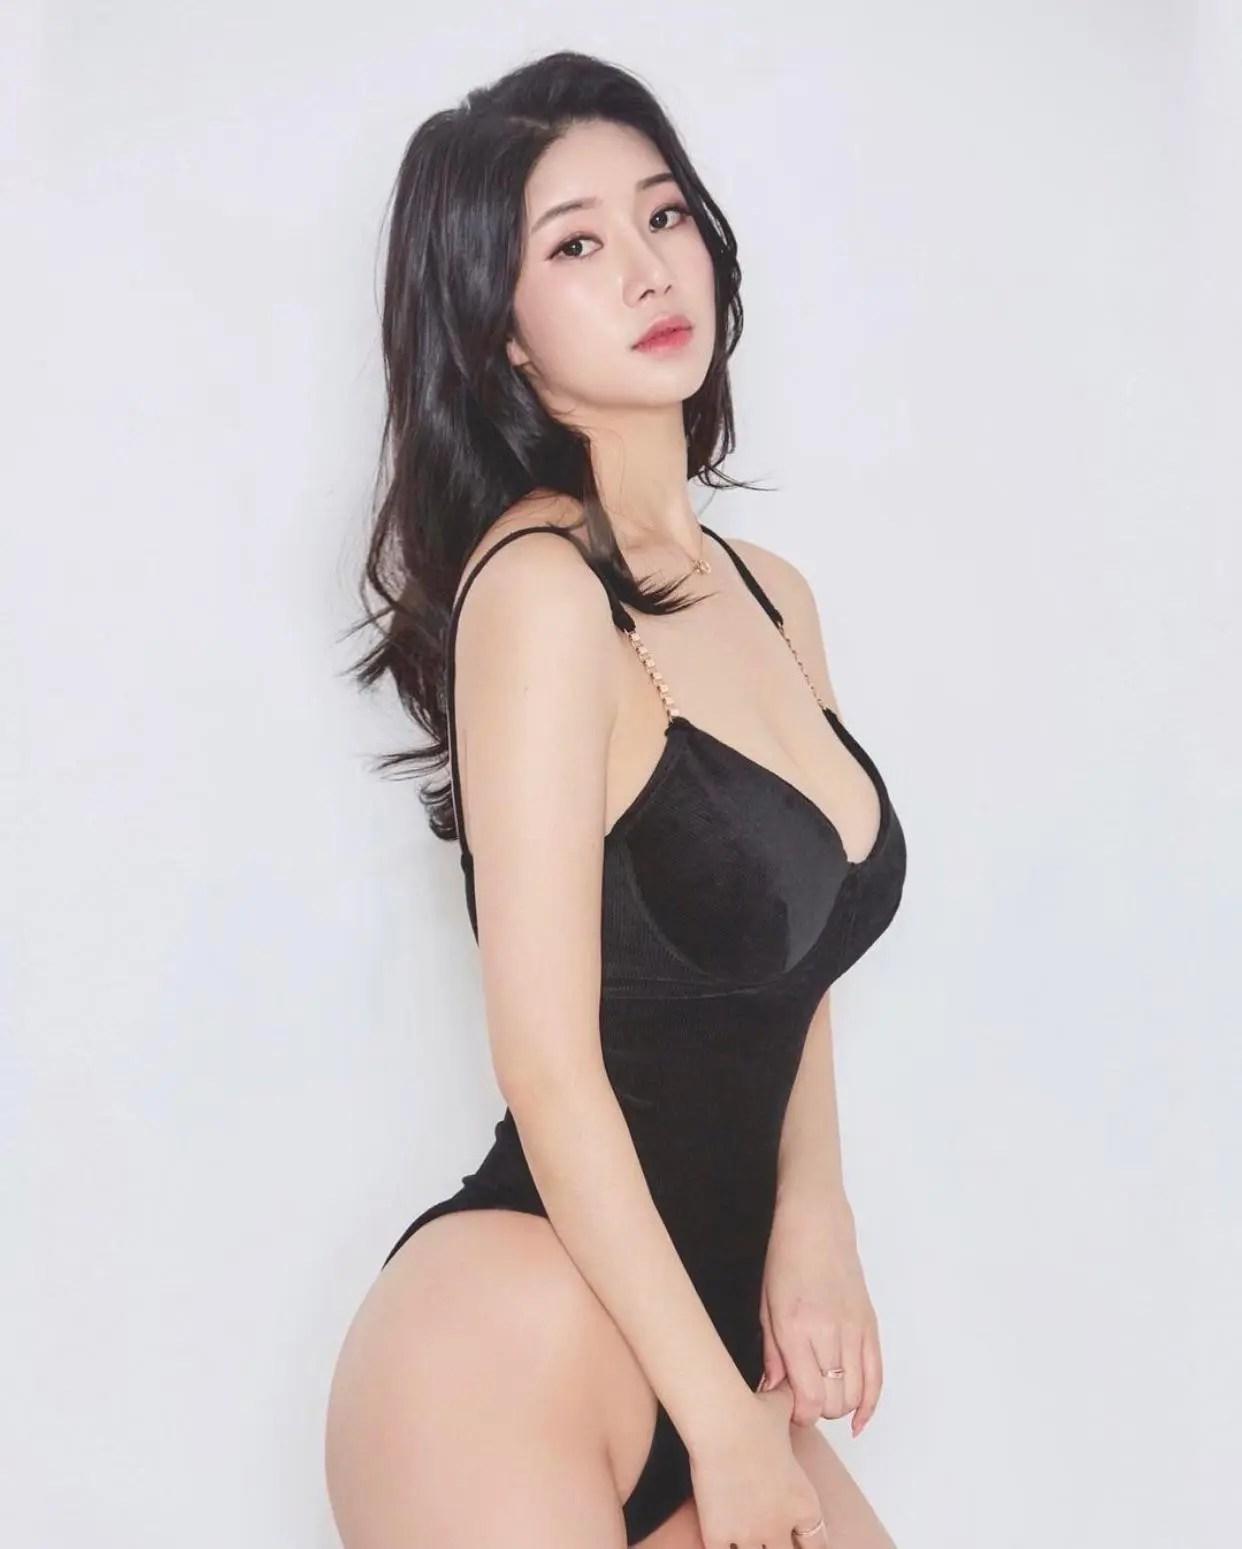 Yen (Instagram profile in comments)